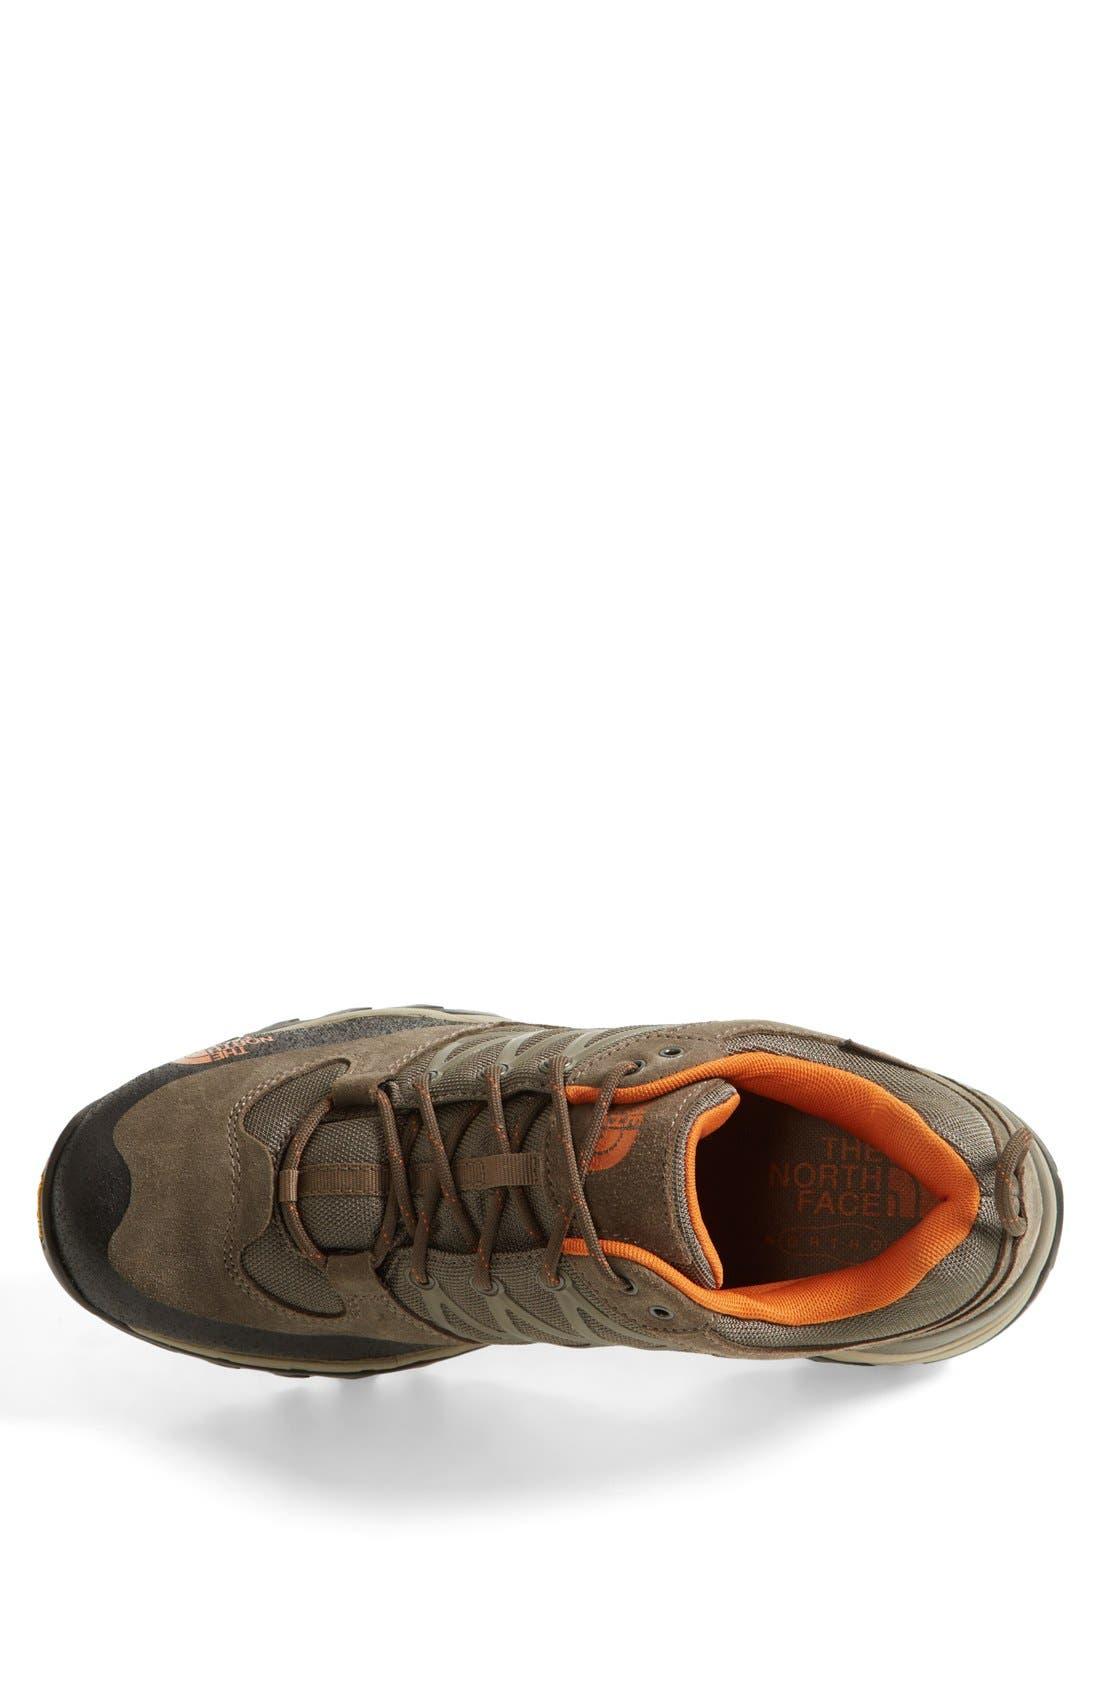 Alternate Image 3  - The North Face 'Storm WP' Hiking Shoe (Men)